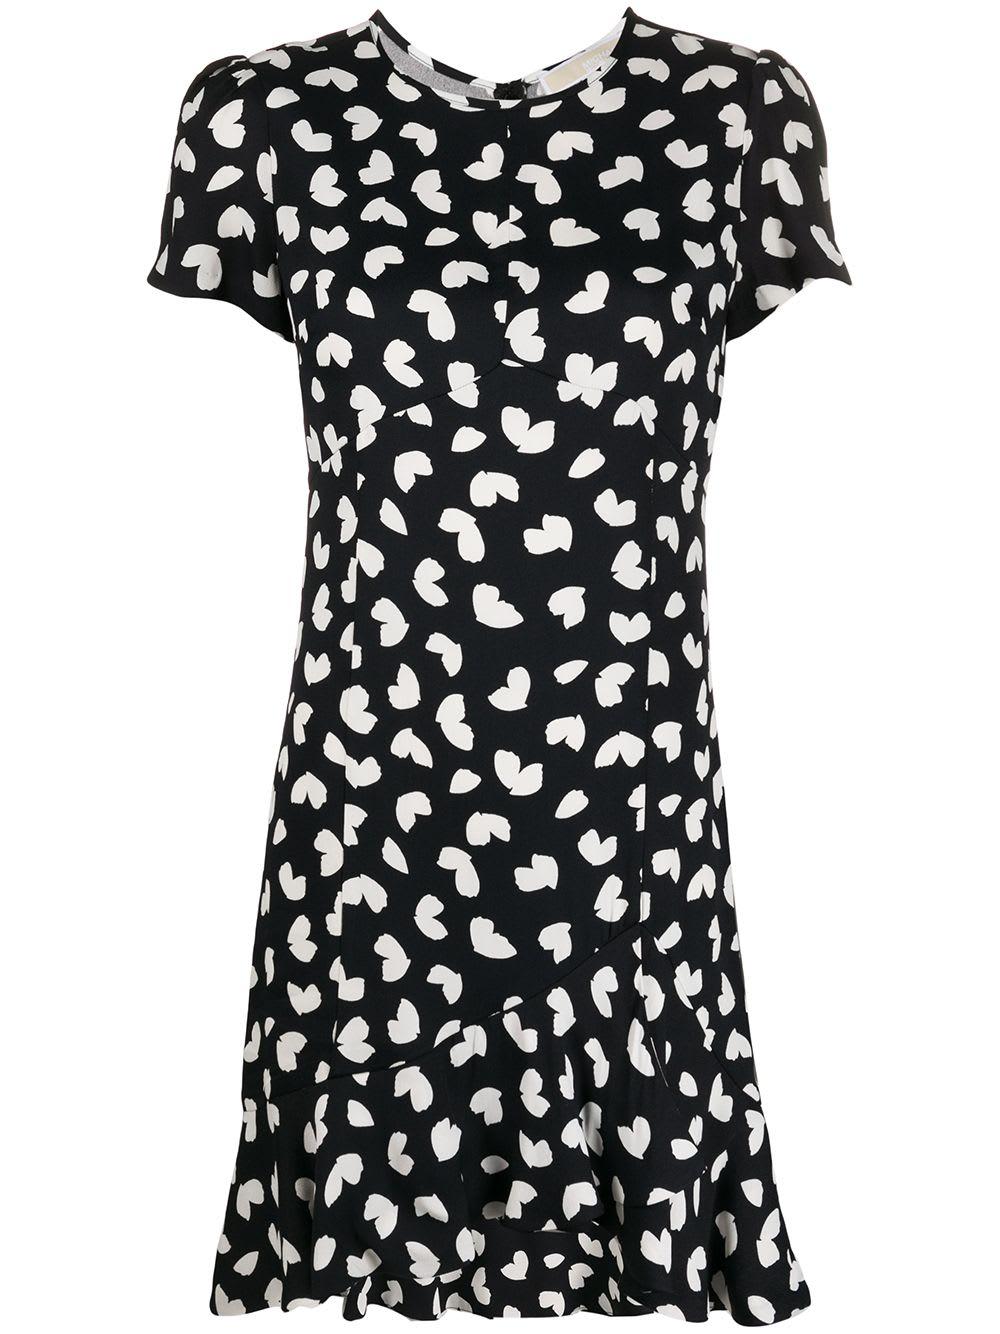 Buy Michael Kors fancy dress. Short dress online, shop Michael Kors with free shipping